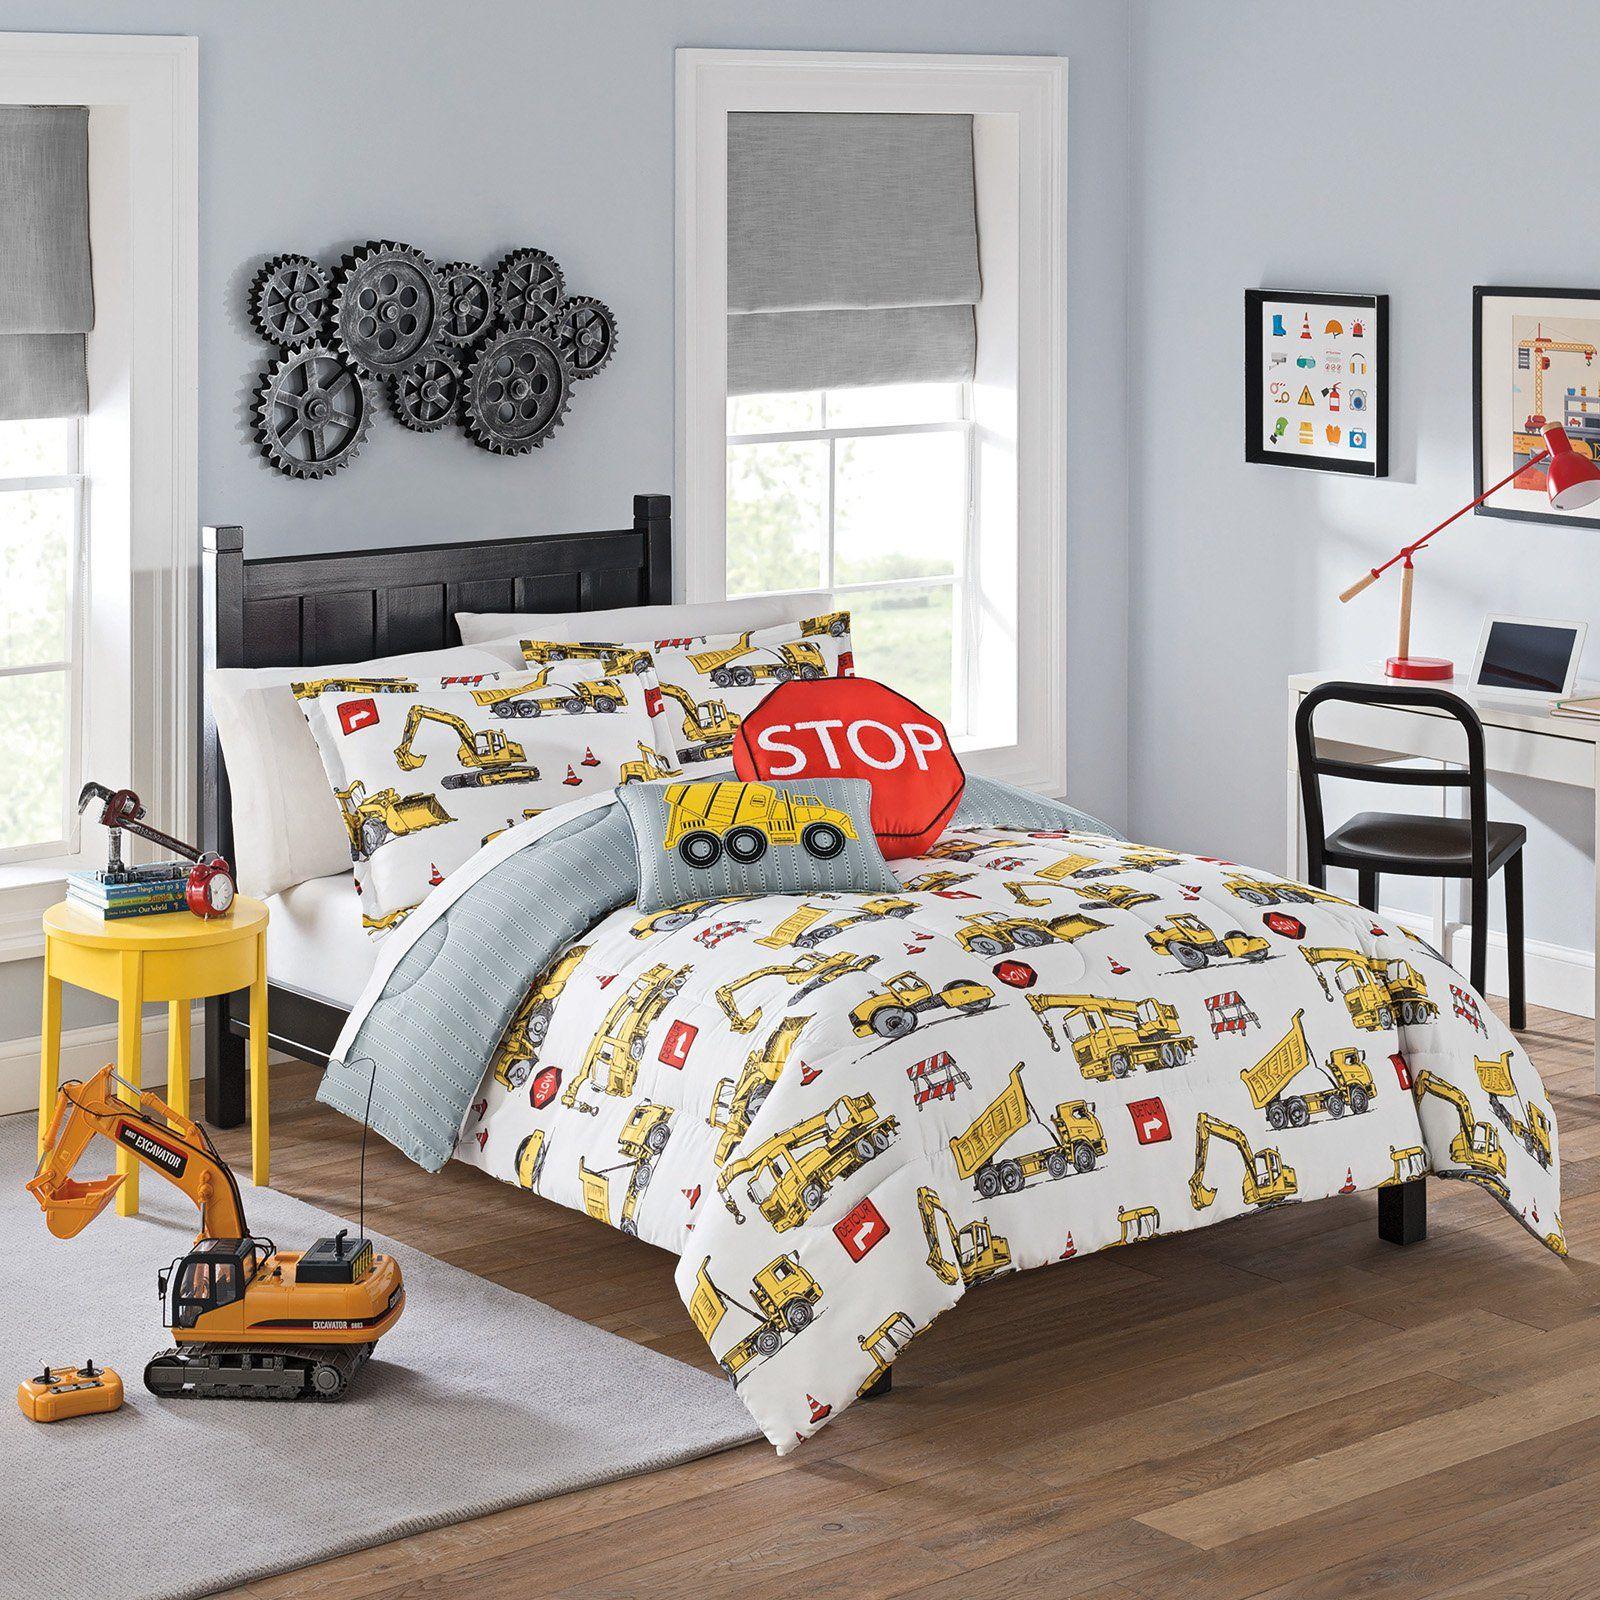 Under Construction Reversible Kids Comforter Set By Waverly Size